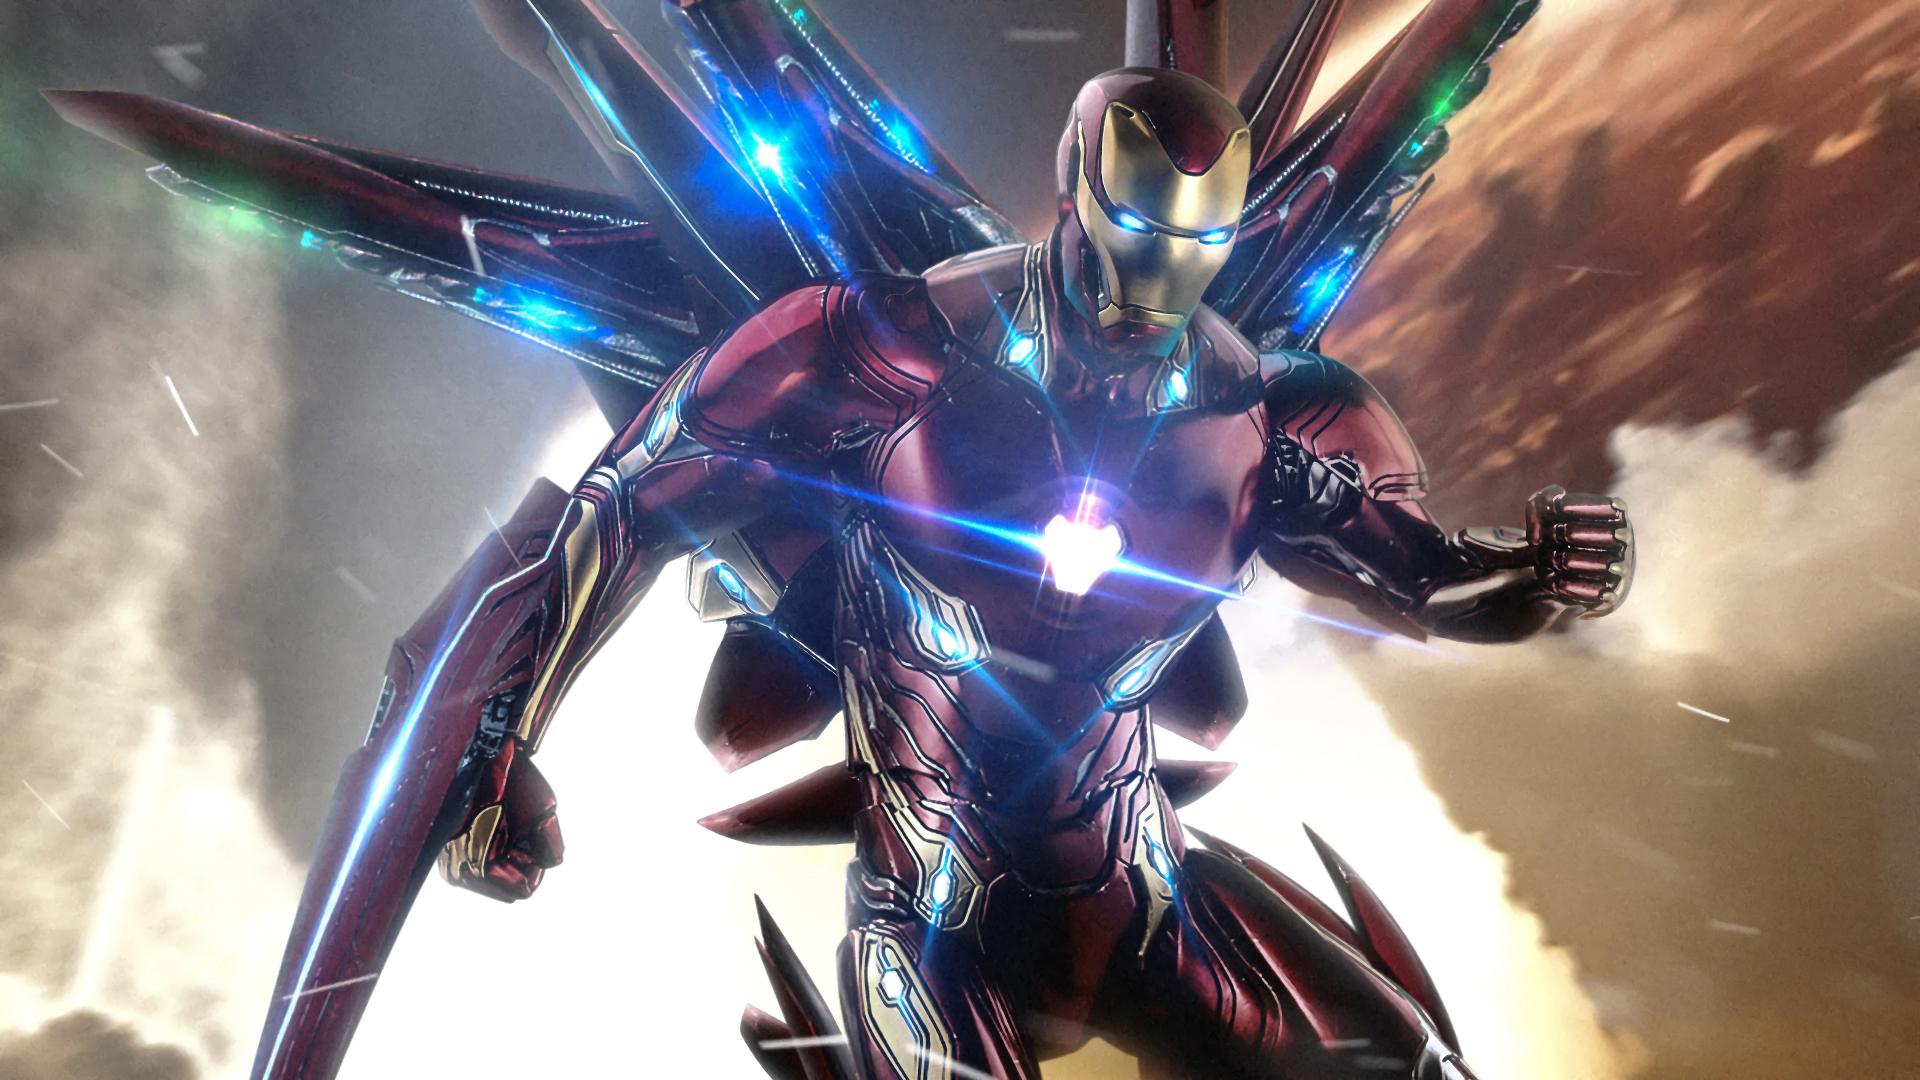 Free Download Iron Man Avengers Endgame 4k 28648 3840x2160 For Your Desktop Mobile Tablet Explore 37 Iron Man 4k Wallpapers 4k Iron Man Wallpapers Iron Man 4k Wallpaper Iron Man 4k Wallpapers